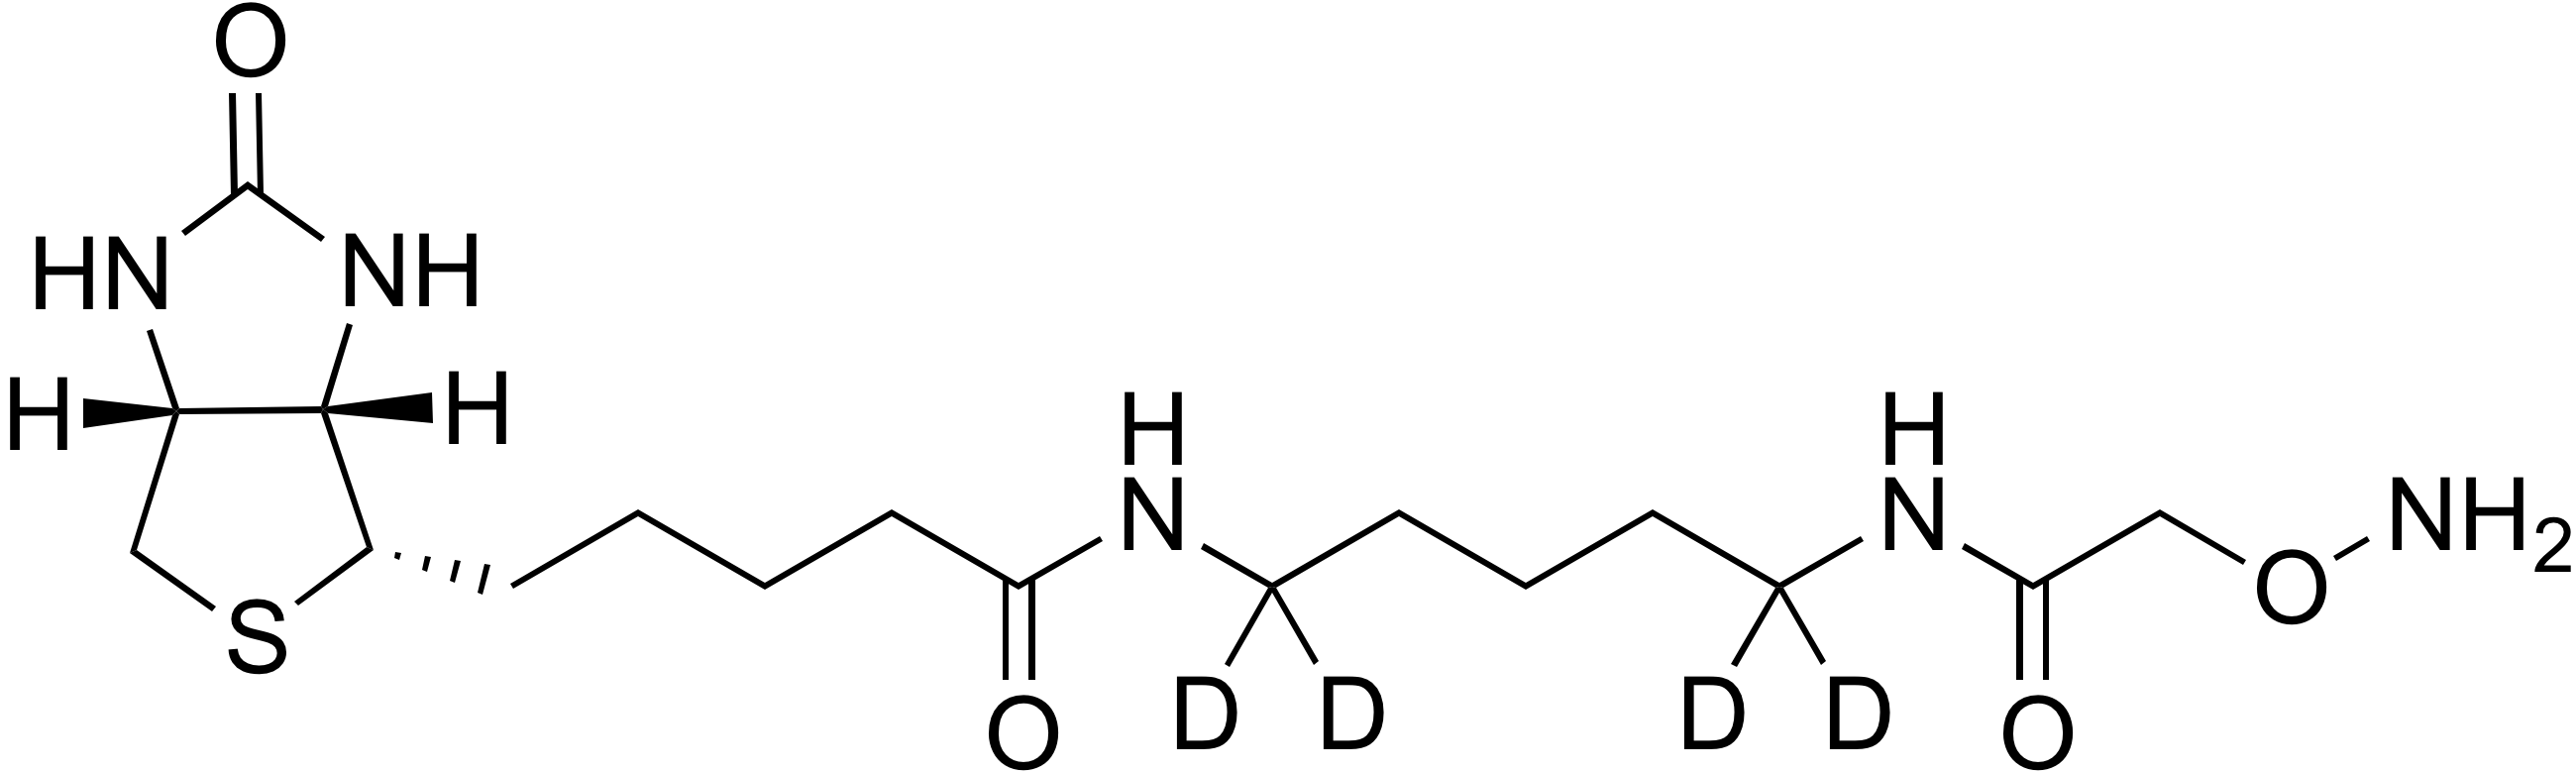 N-(5-Aminooxyacetamidopentyl-d<sub>4</sub>)-biotinamide